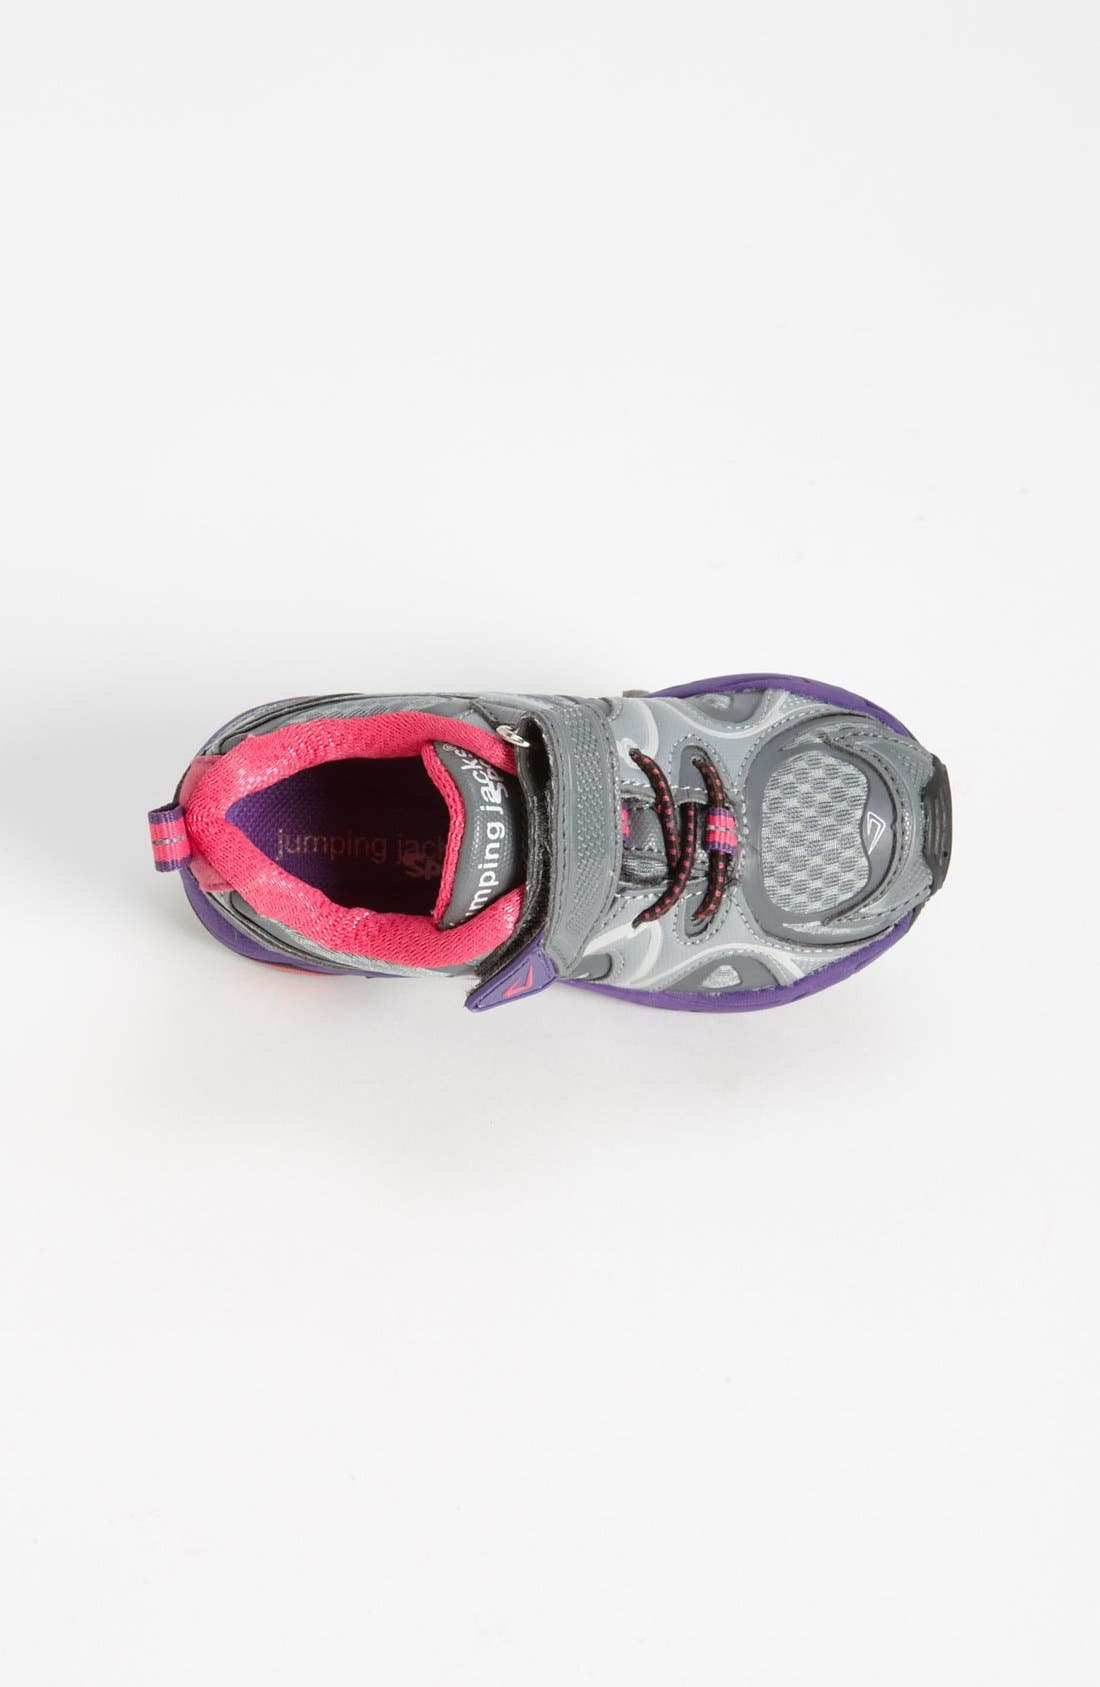 Alternate Image 3  - Jumping Jacks 'Titan' Sneaker (Walker, Toddler, Little Kid & Big Kid)